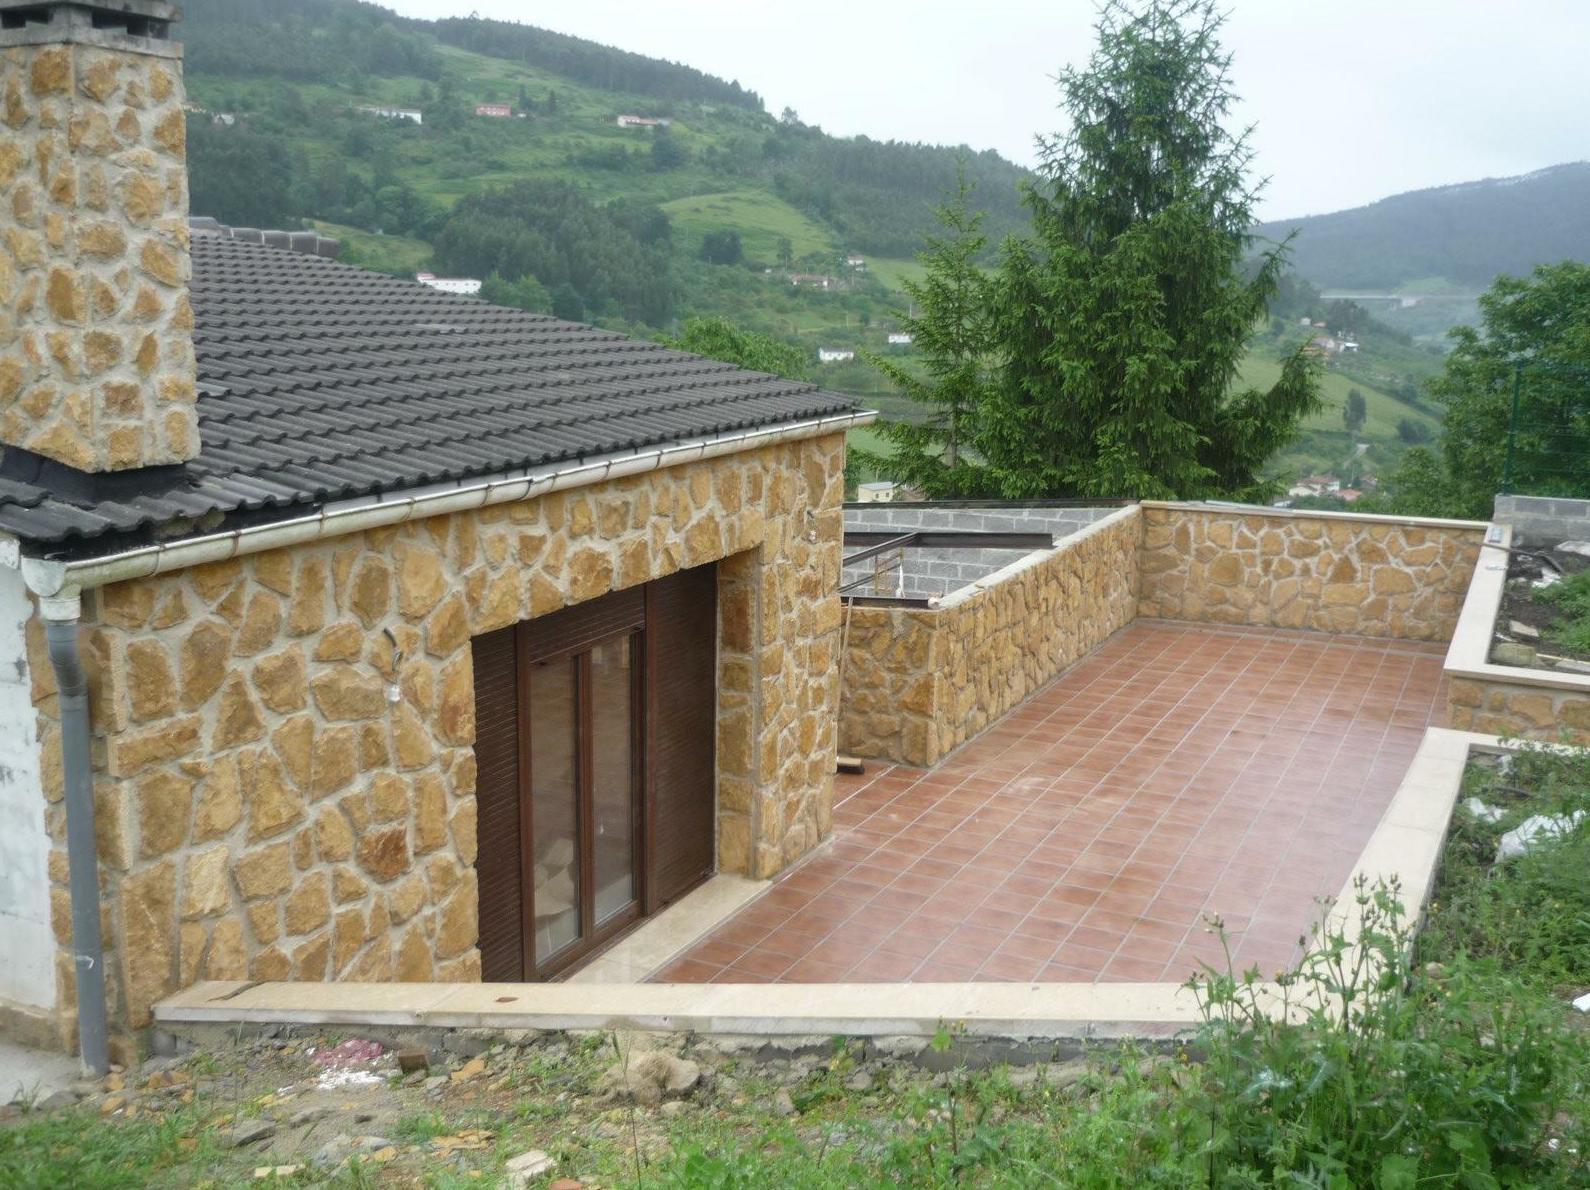 Reforma de casas en Colunga